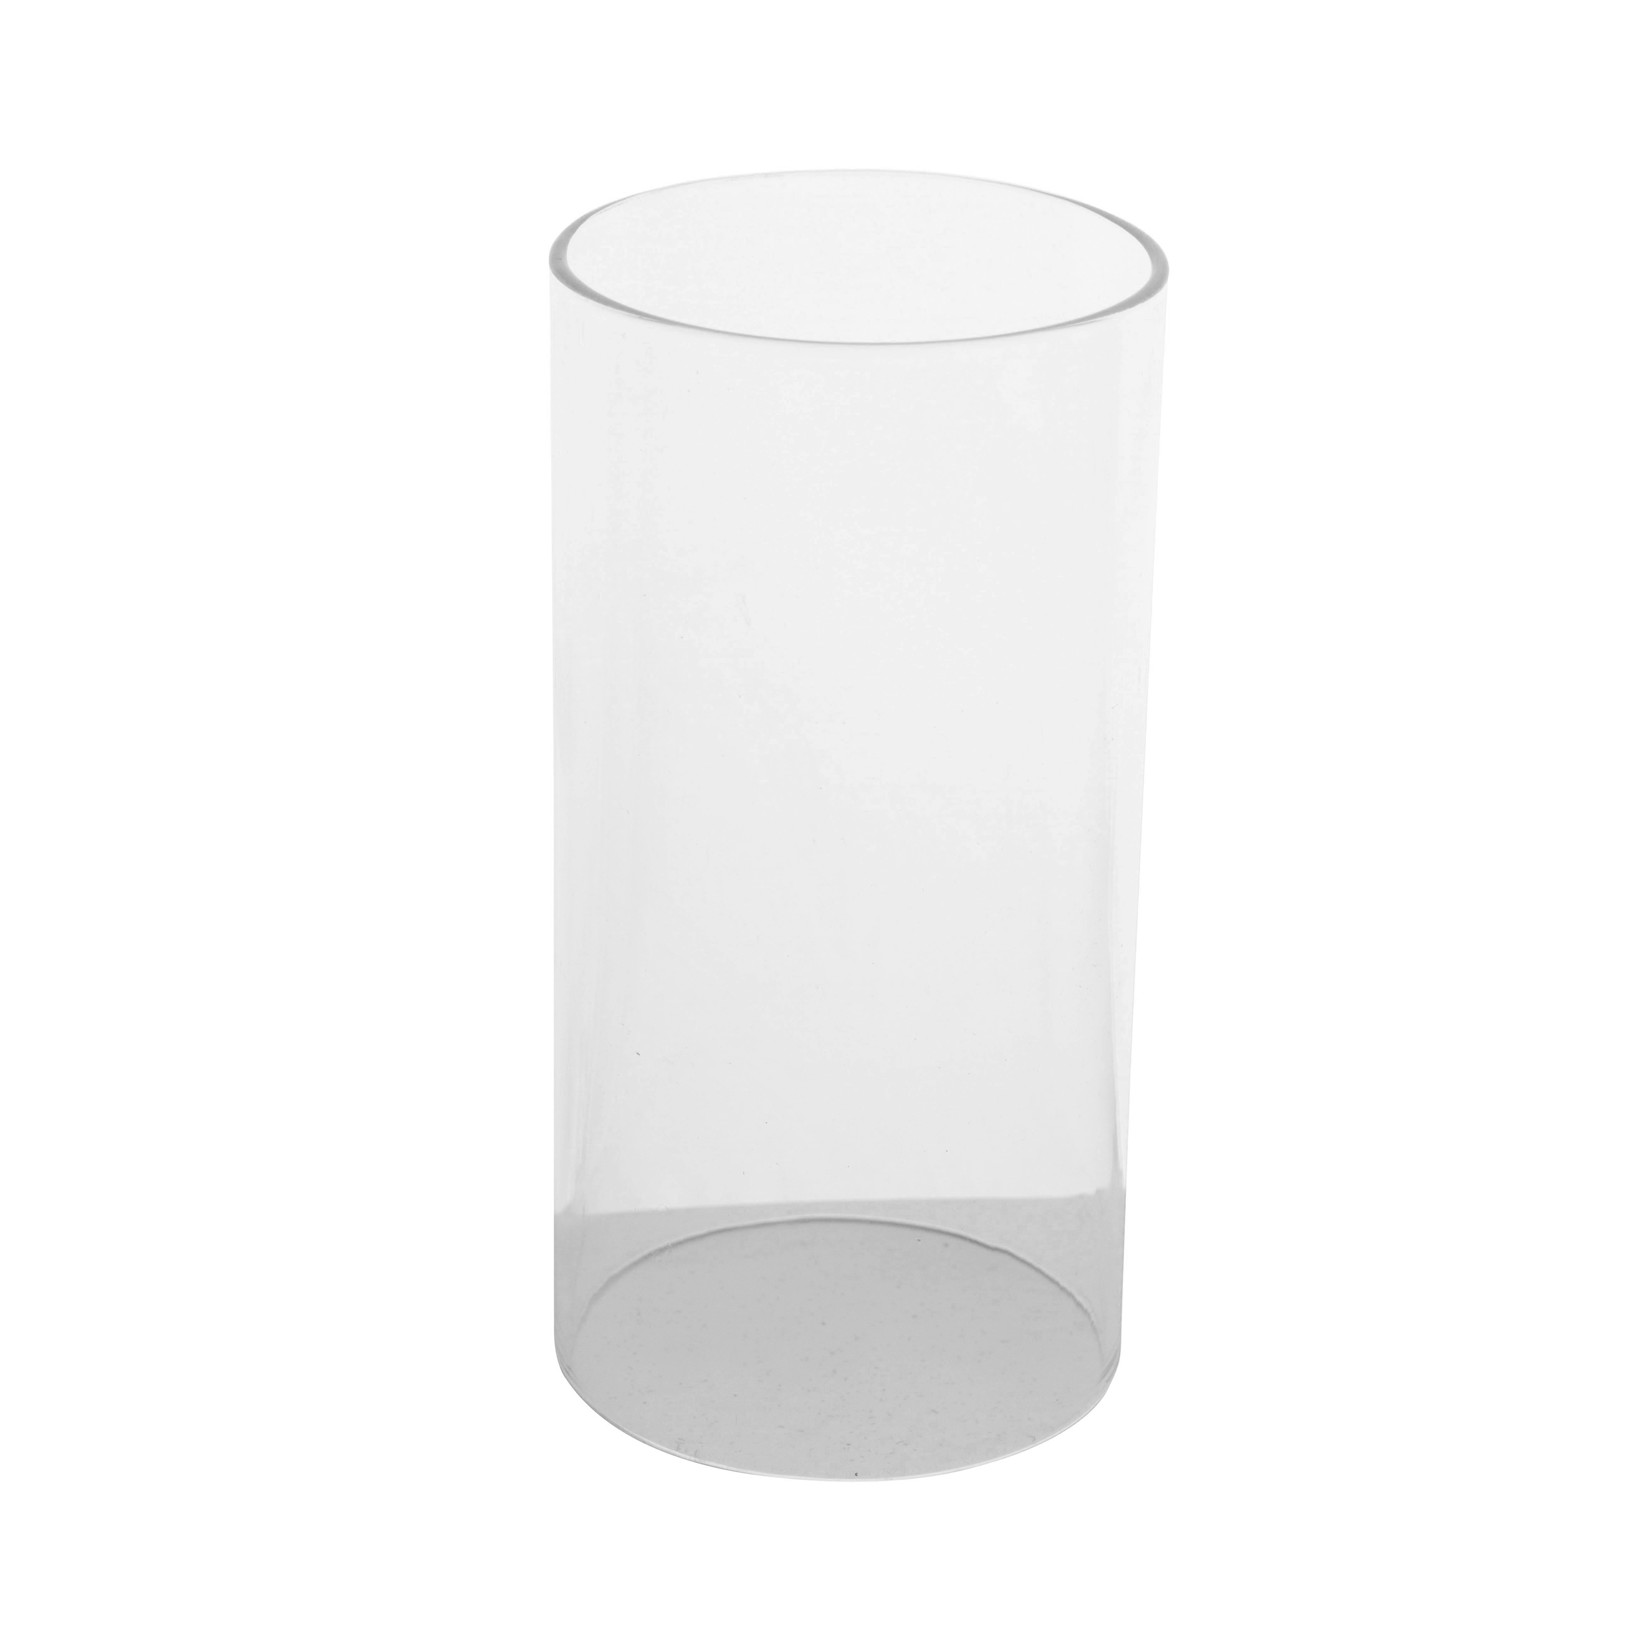 Glas til olielampe - Basic klar